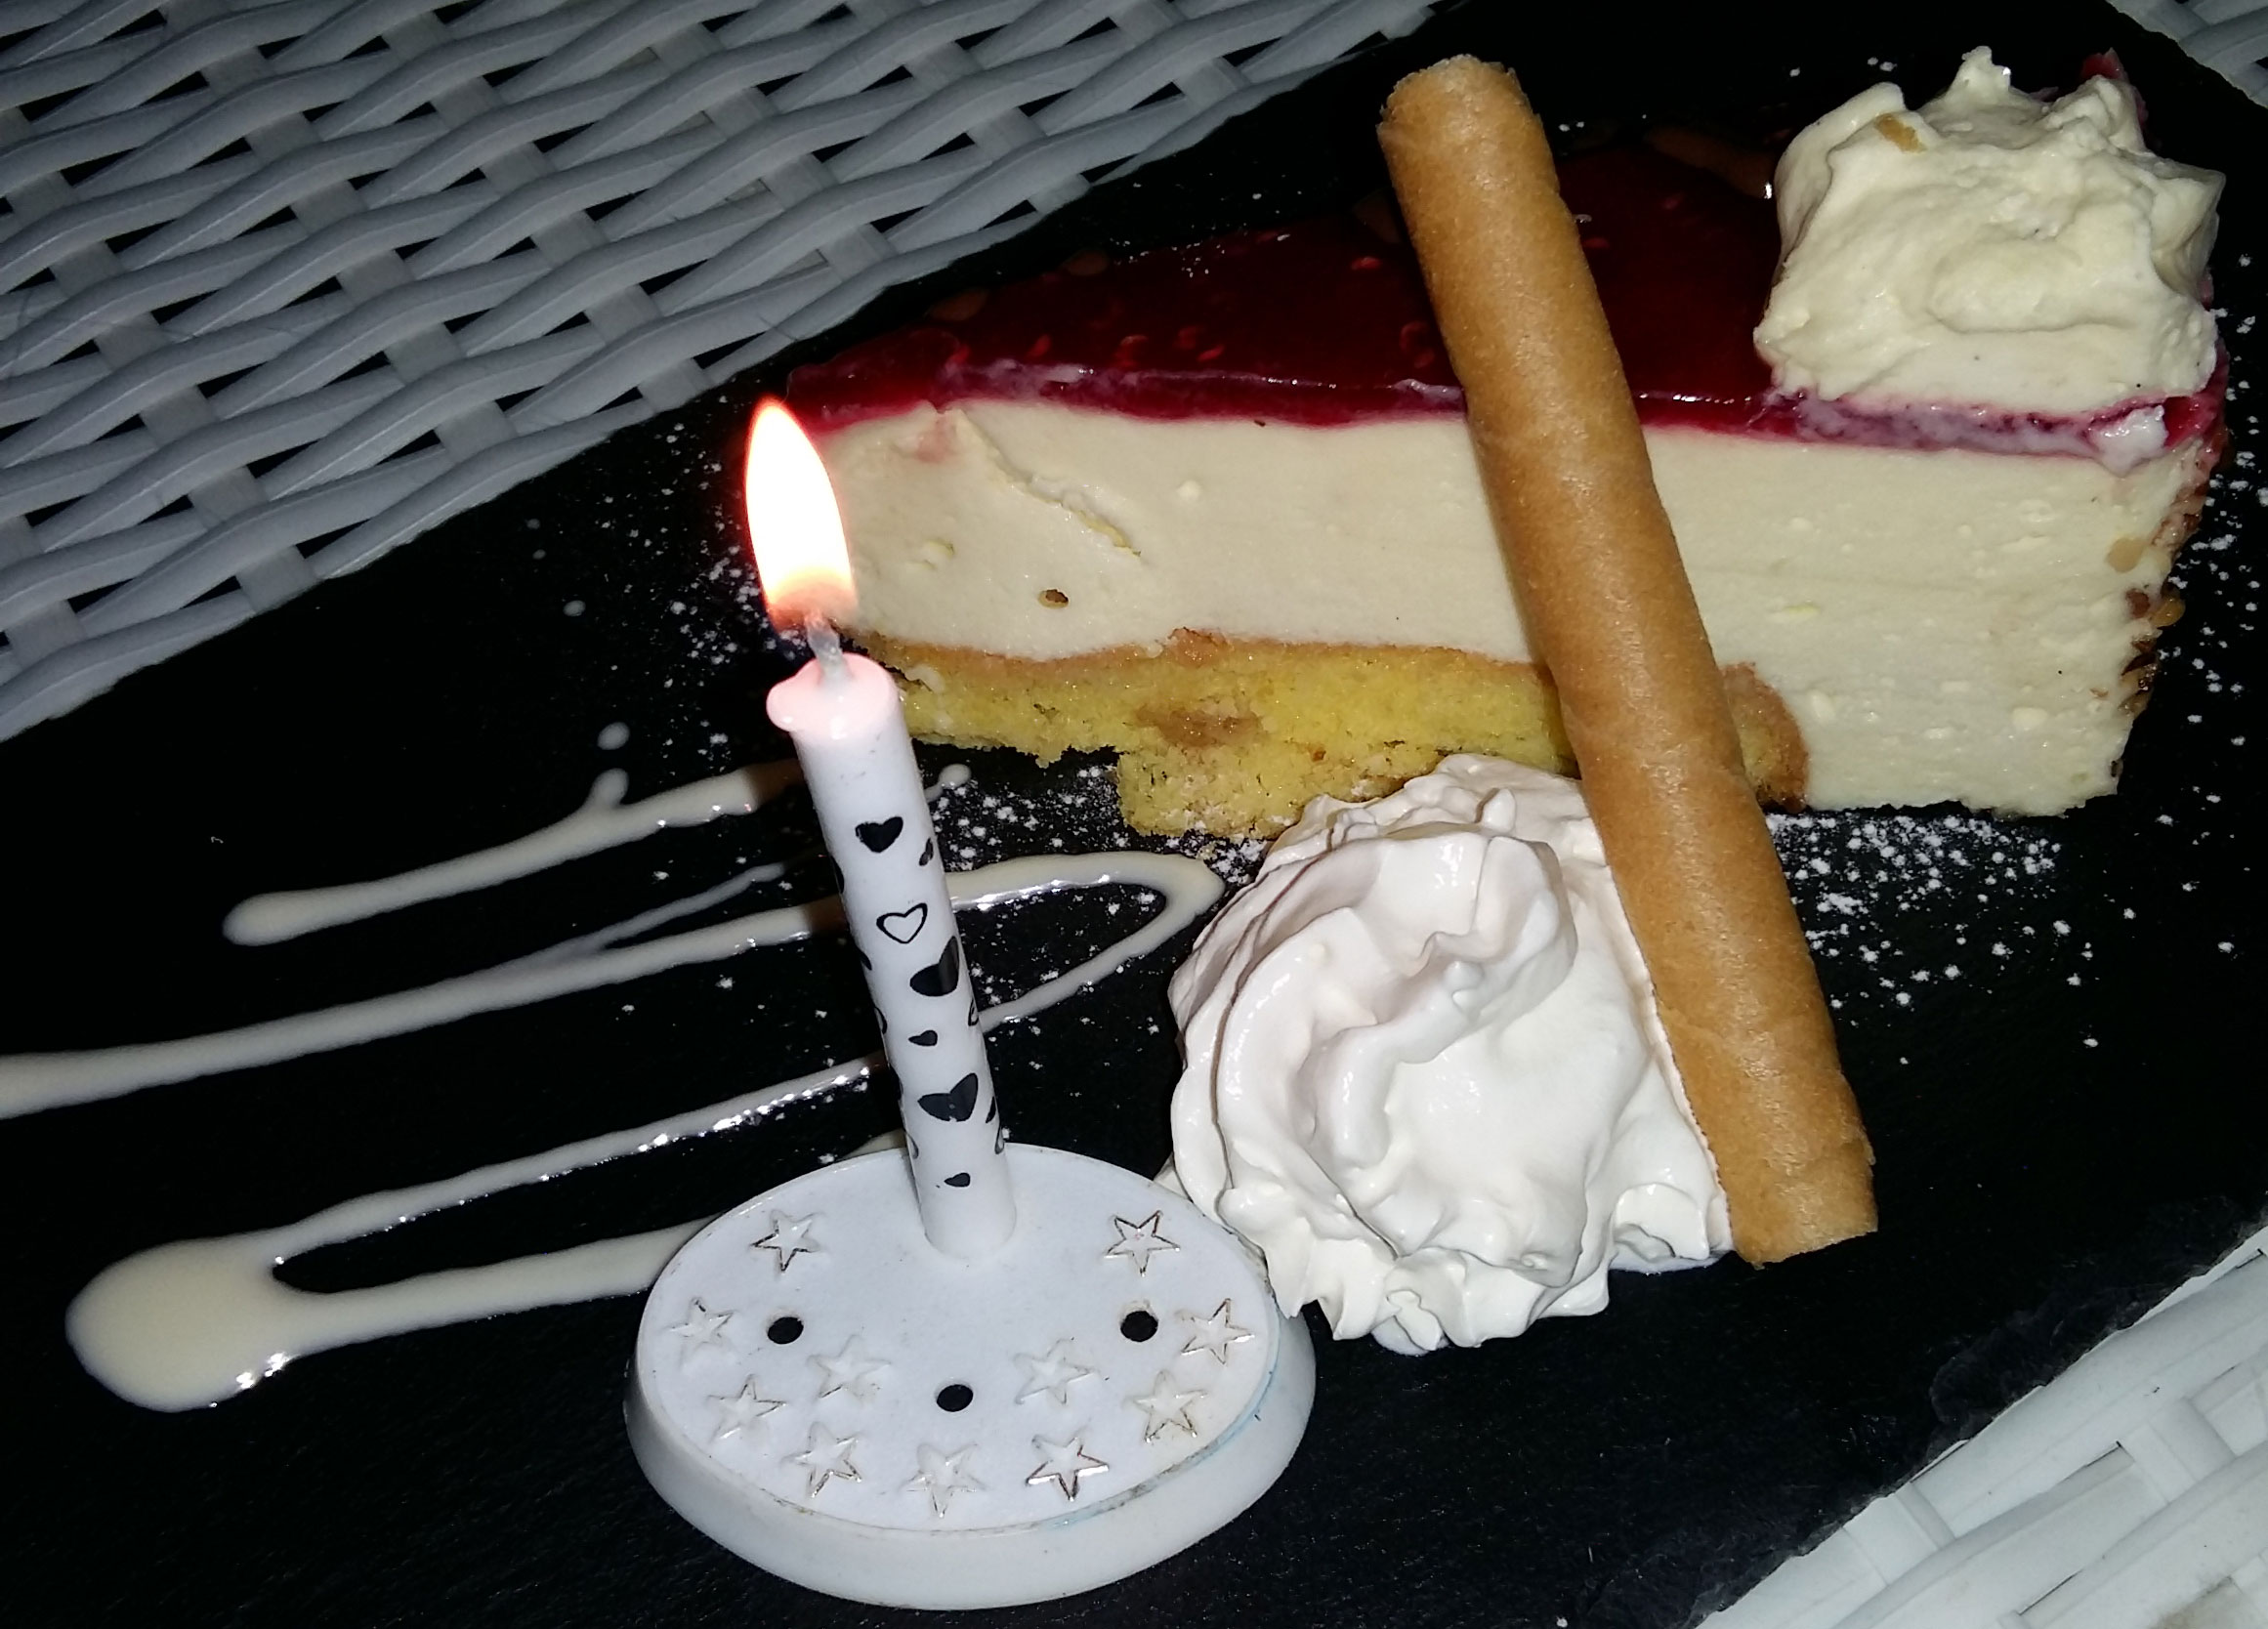 cake-torta-karotina-30-anni-diario-blog